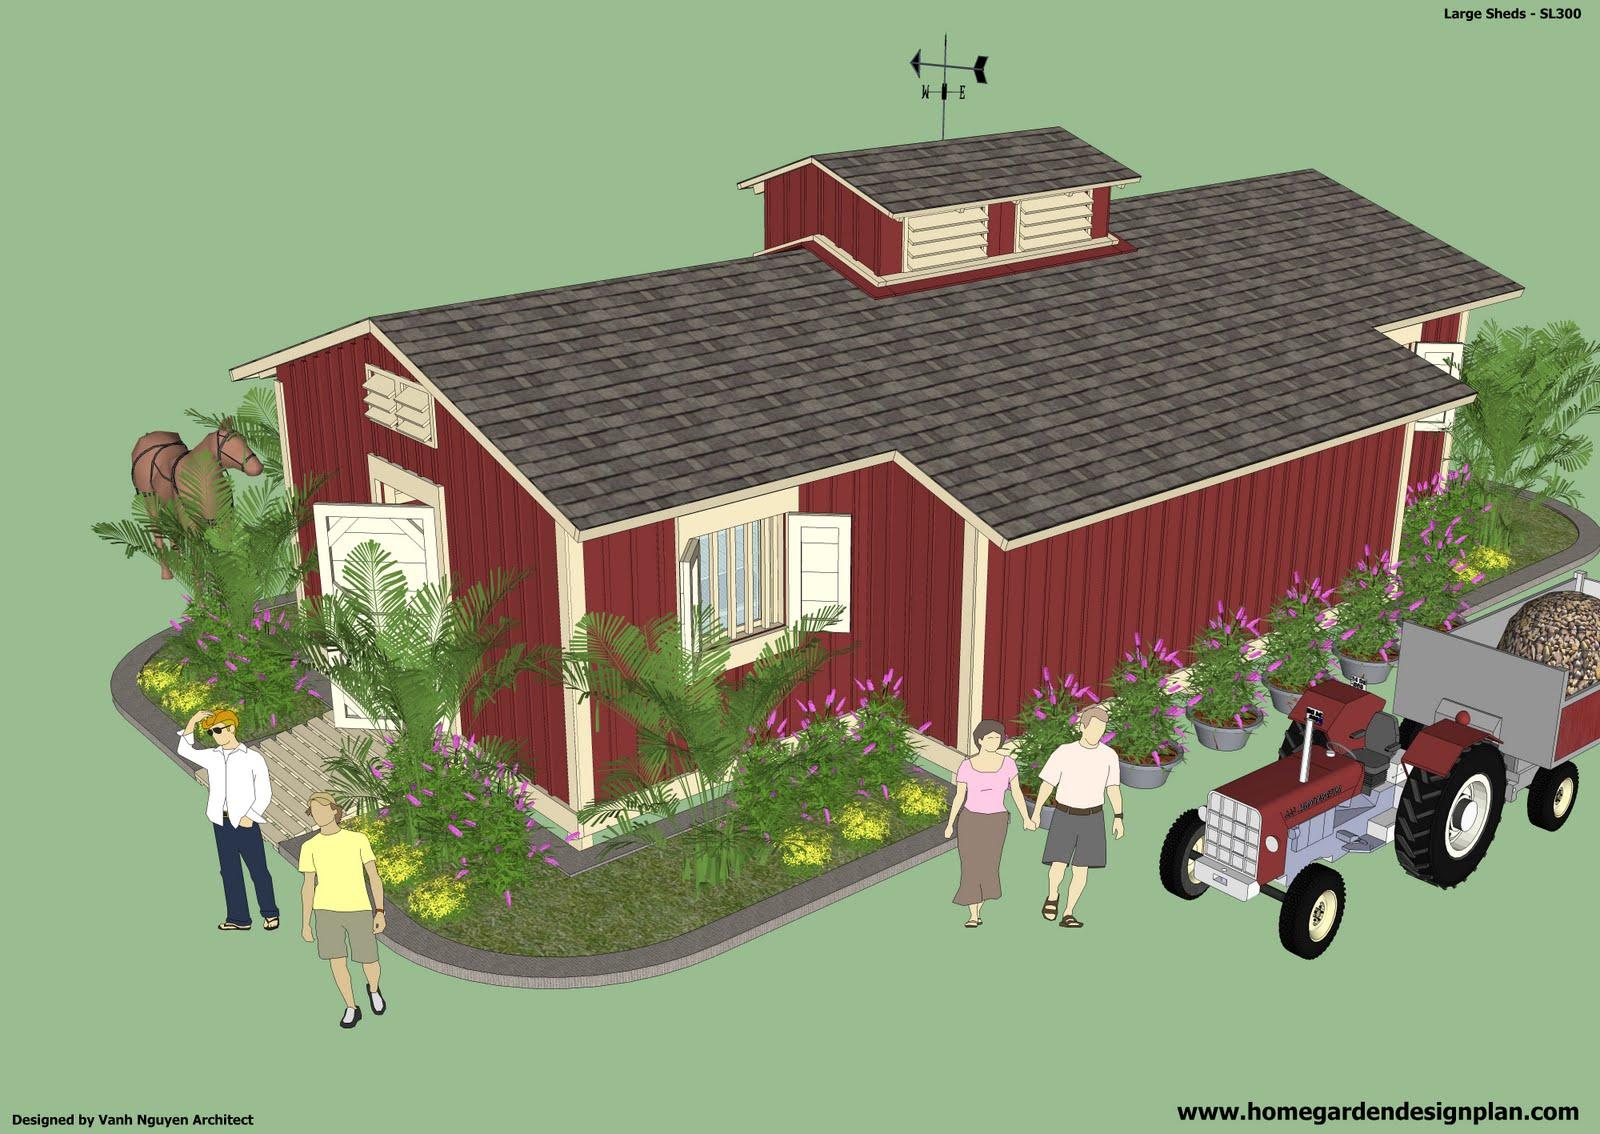 Garden Sheds Julianstown simple garden sheds julianstown 29 preston park co meath south